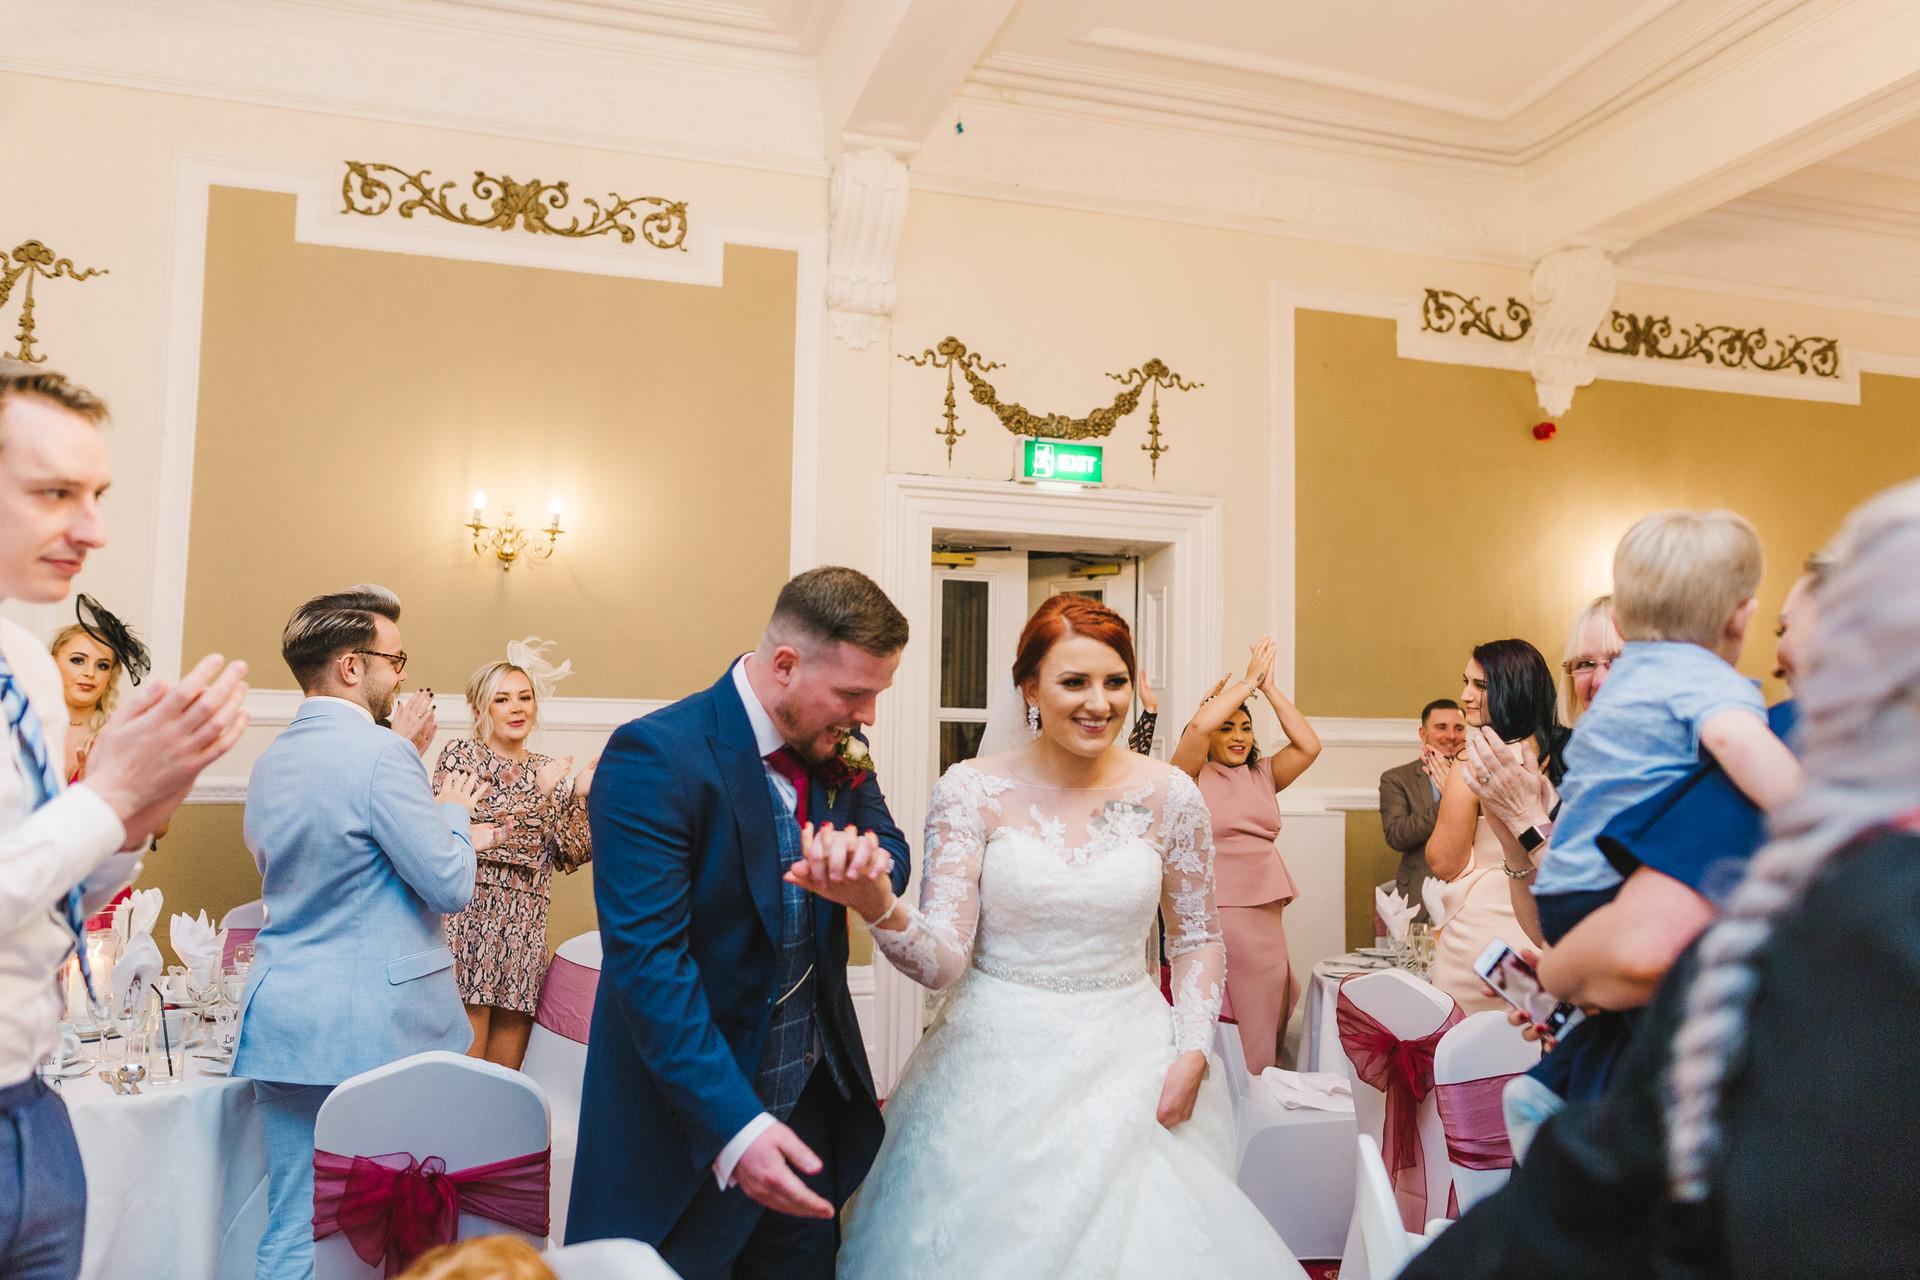 ilkley-west-yorkshire-wedding-146.jpg